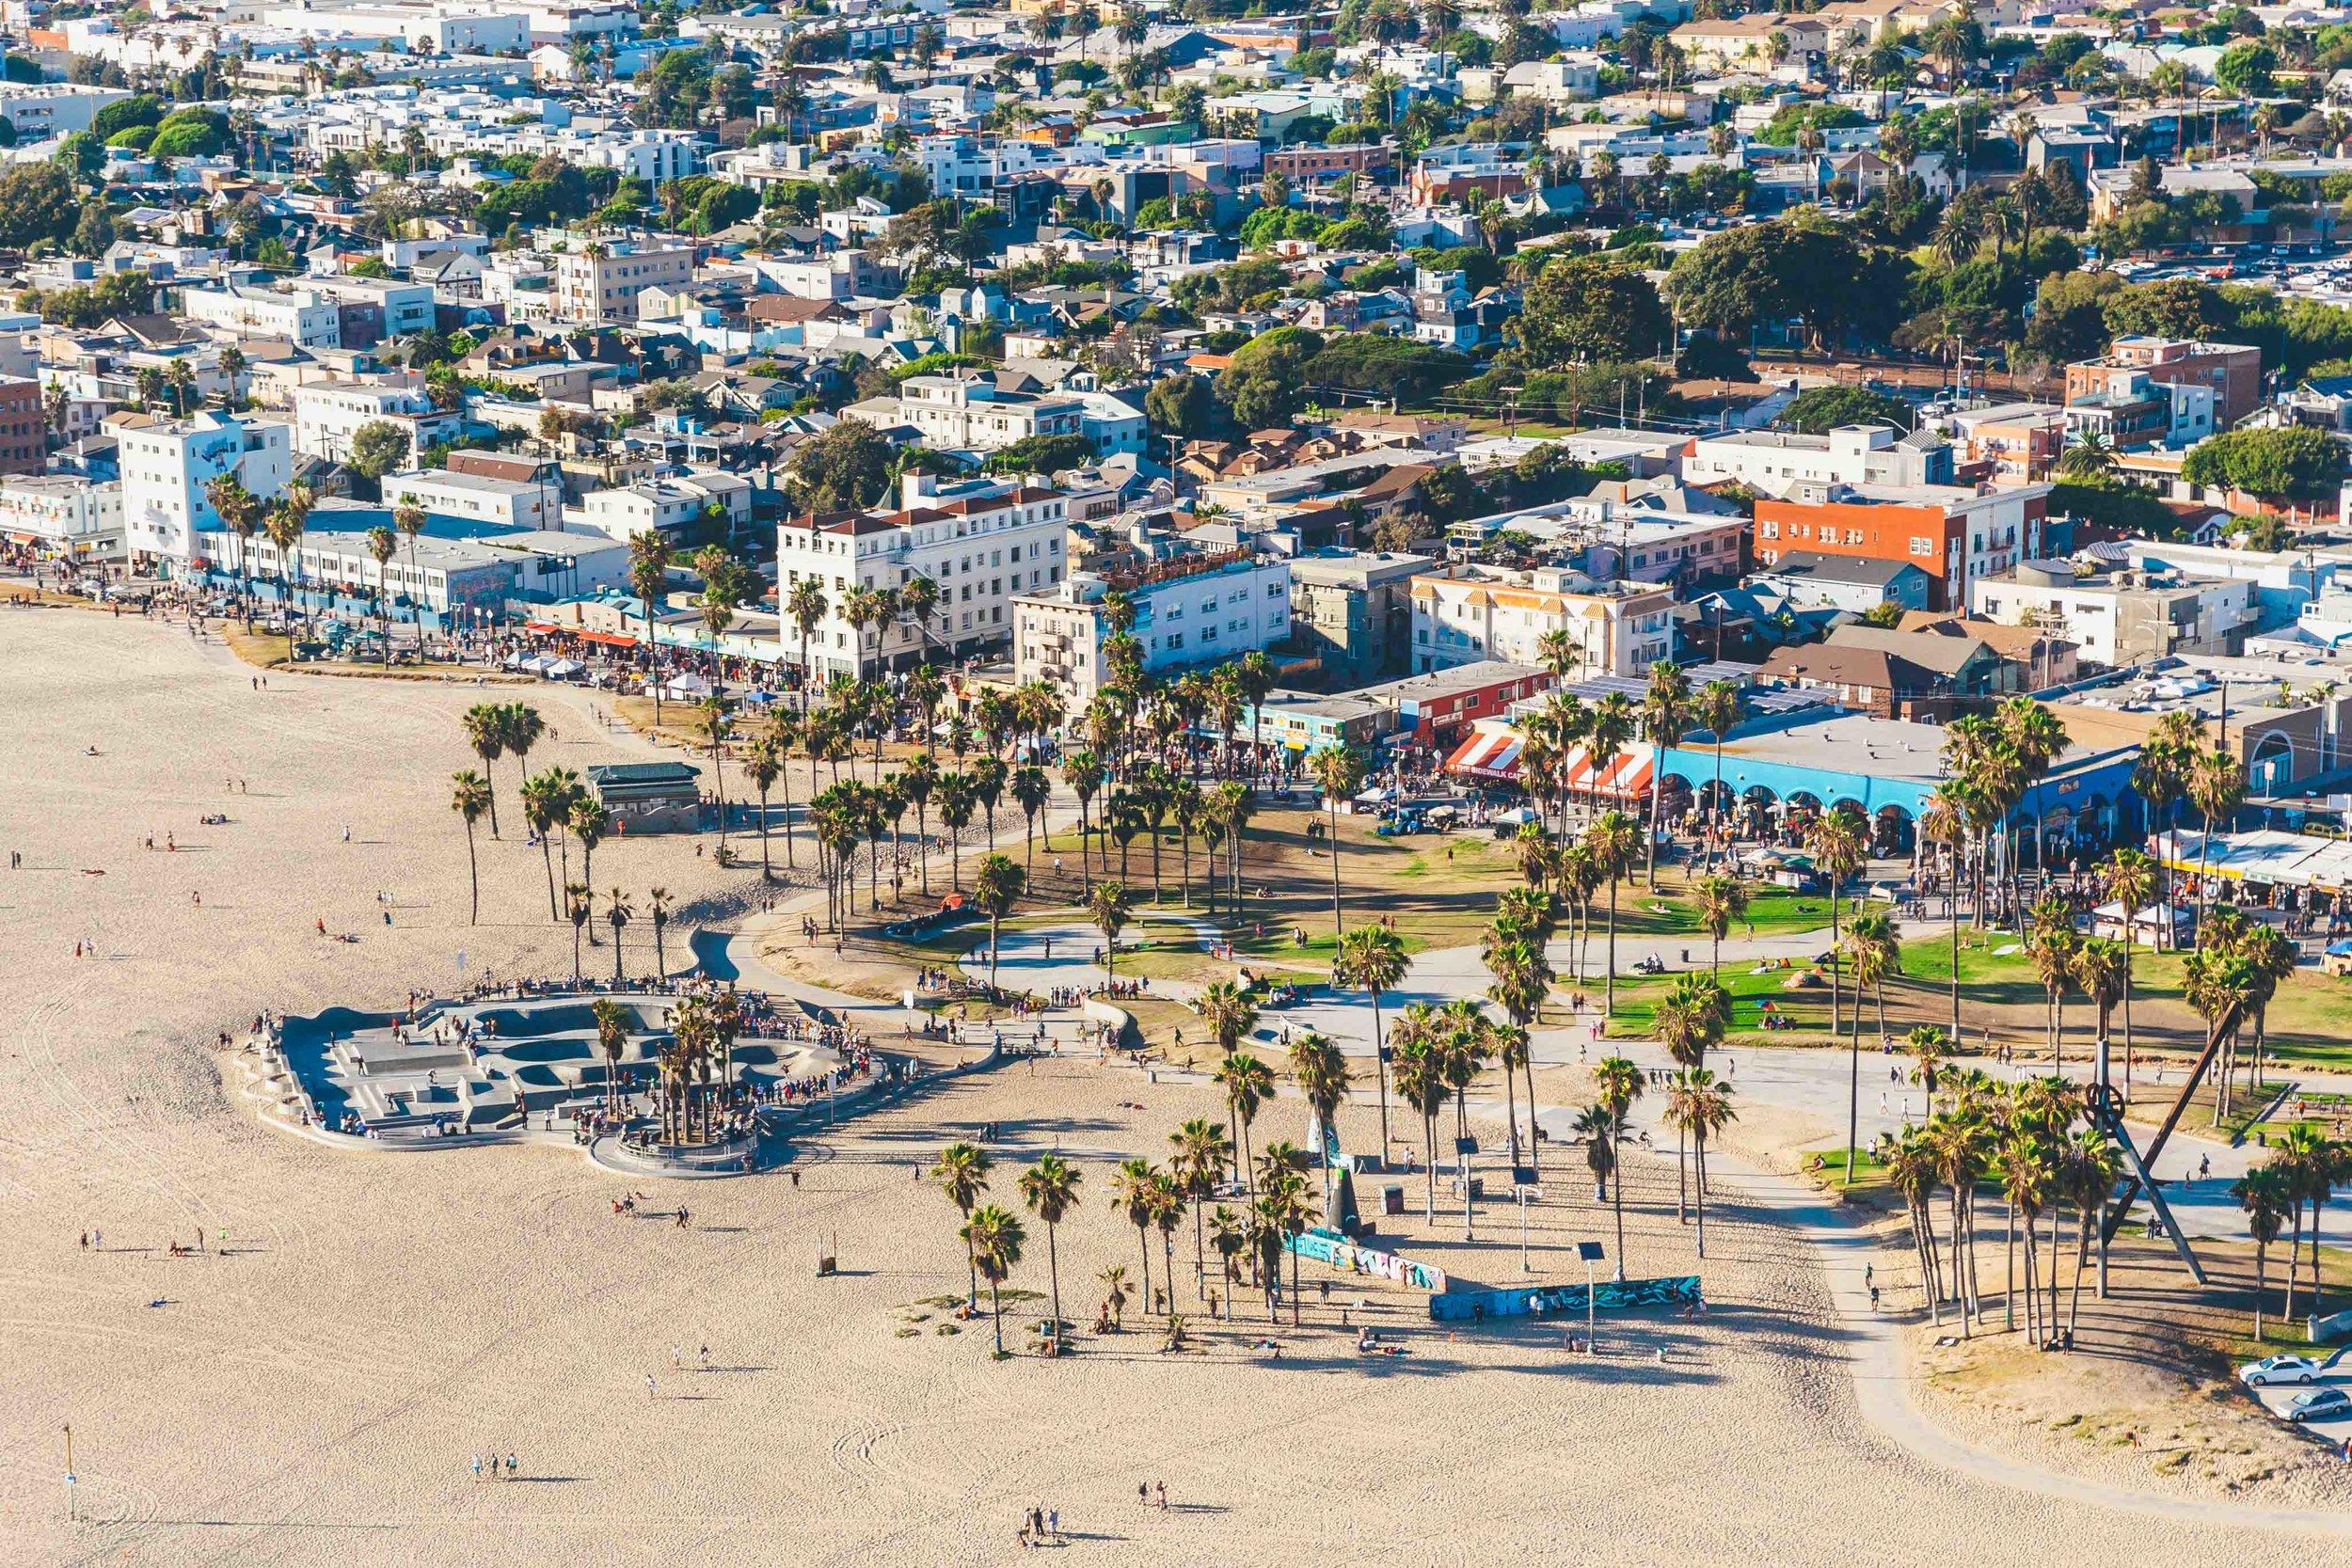 2015-LA-Aerial-006-sm.jpg